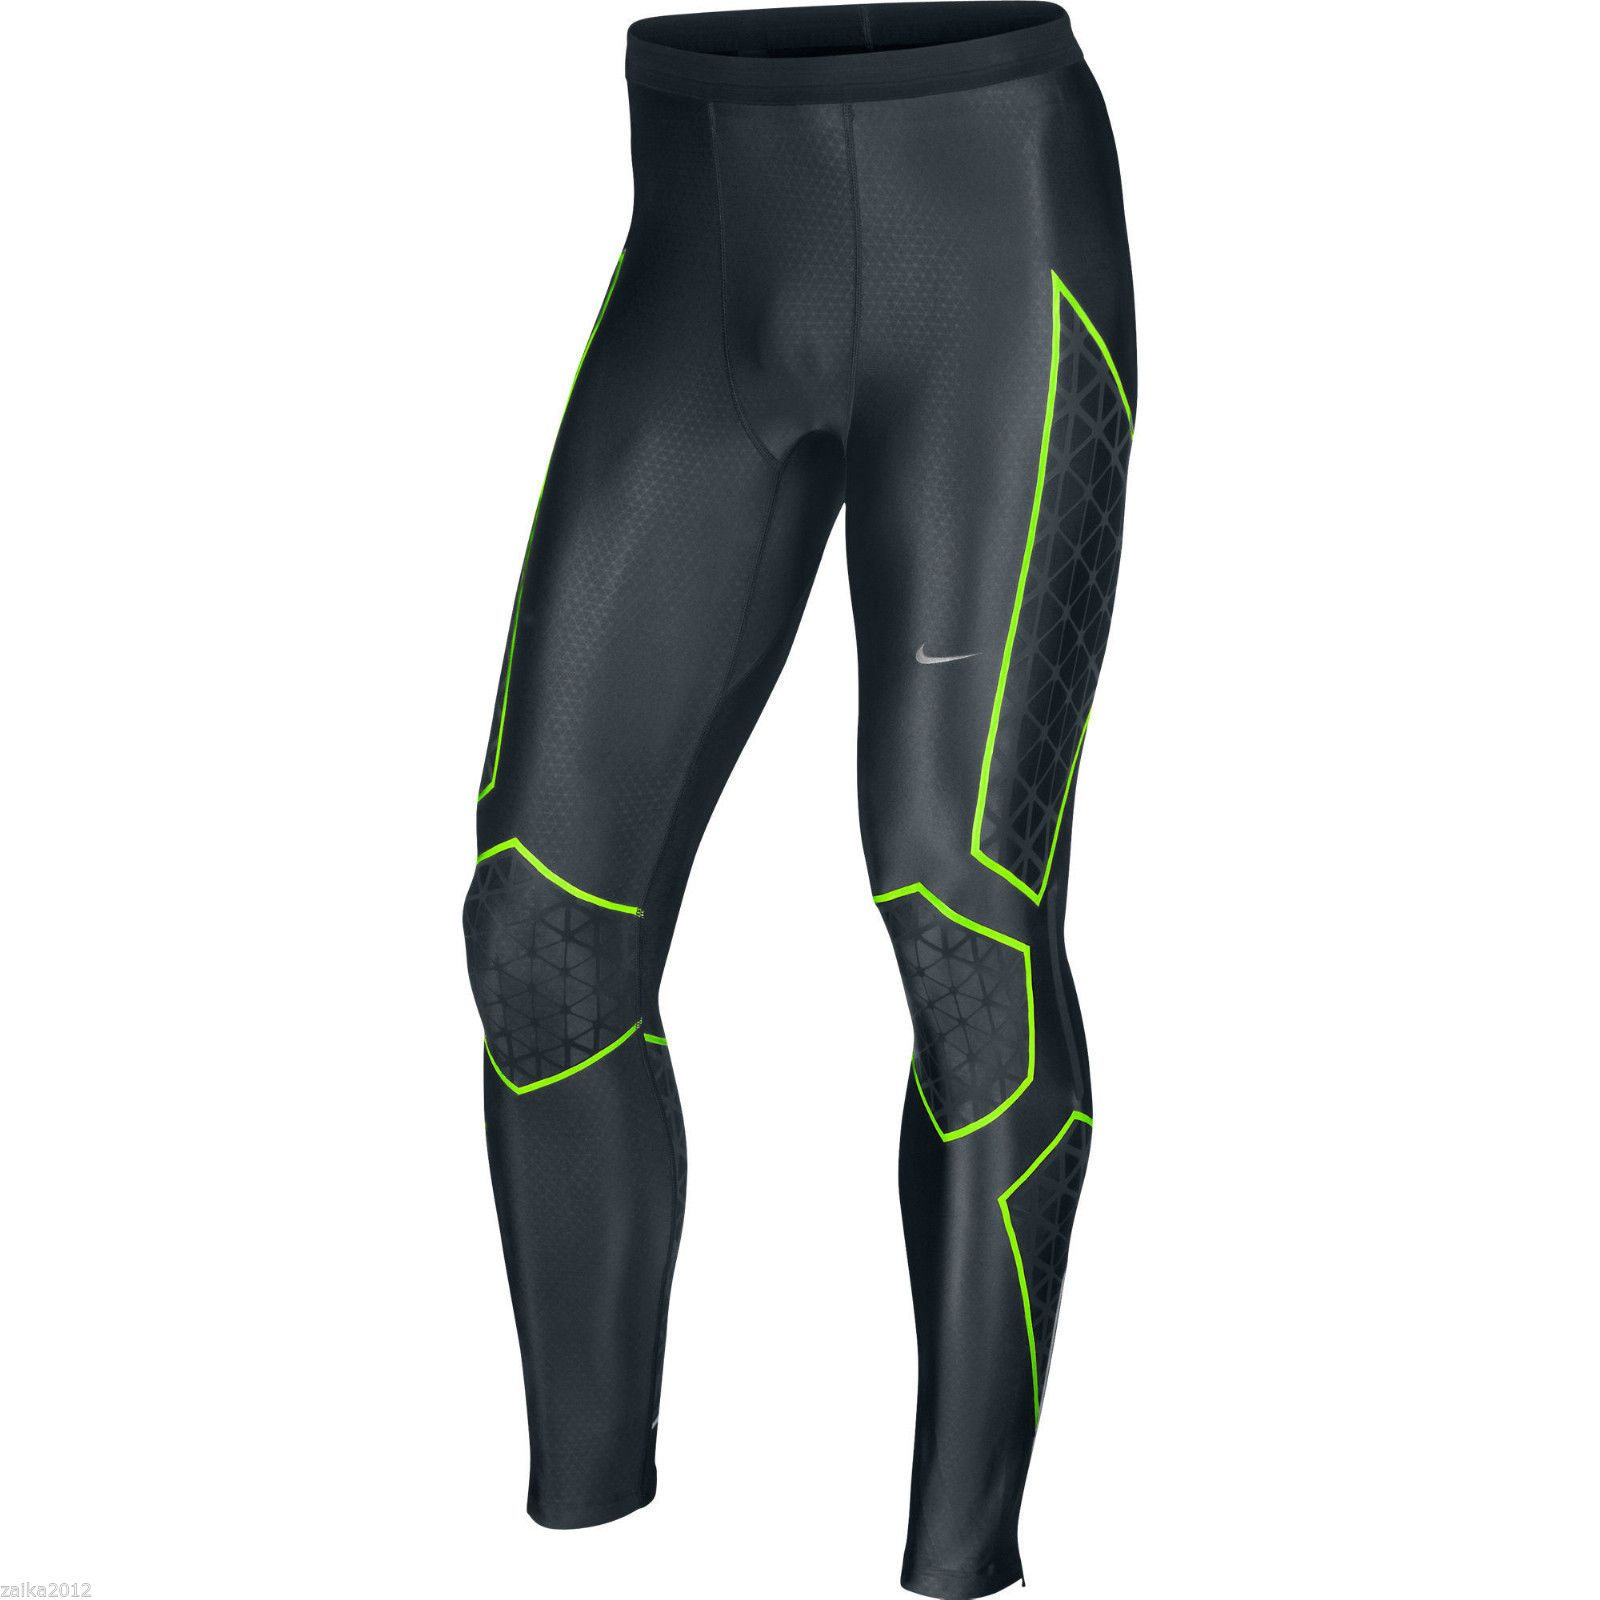 Nike Swift Tights Mens Running Sz 2XL Leggings Pant $140 ...